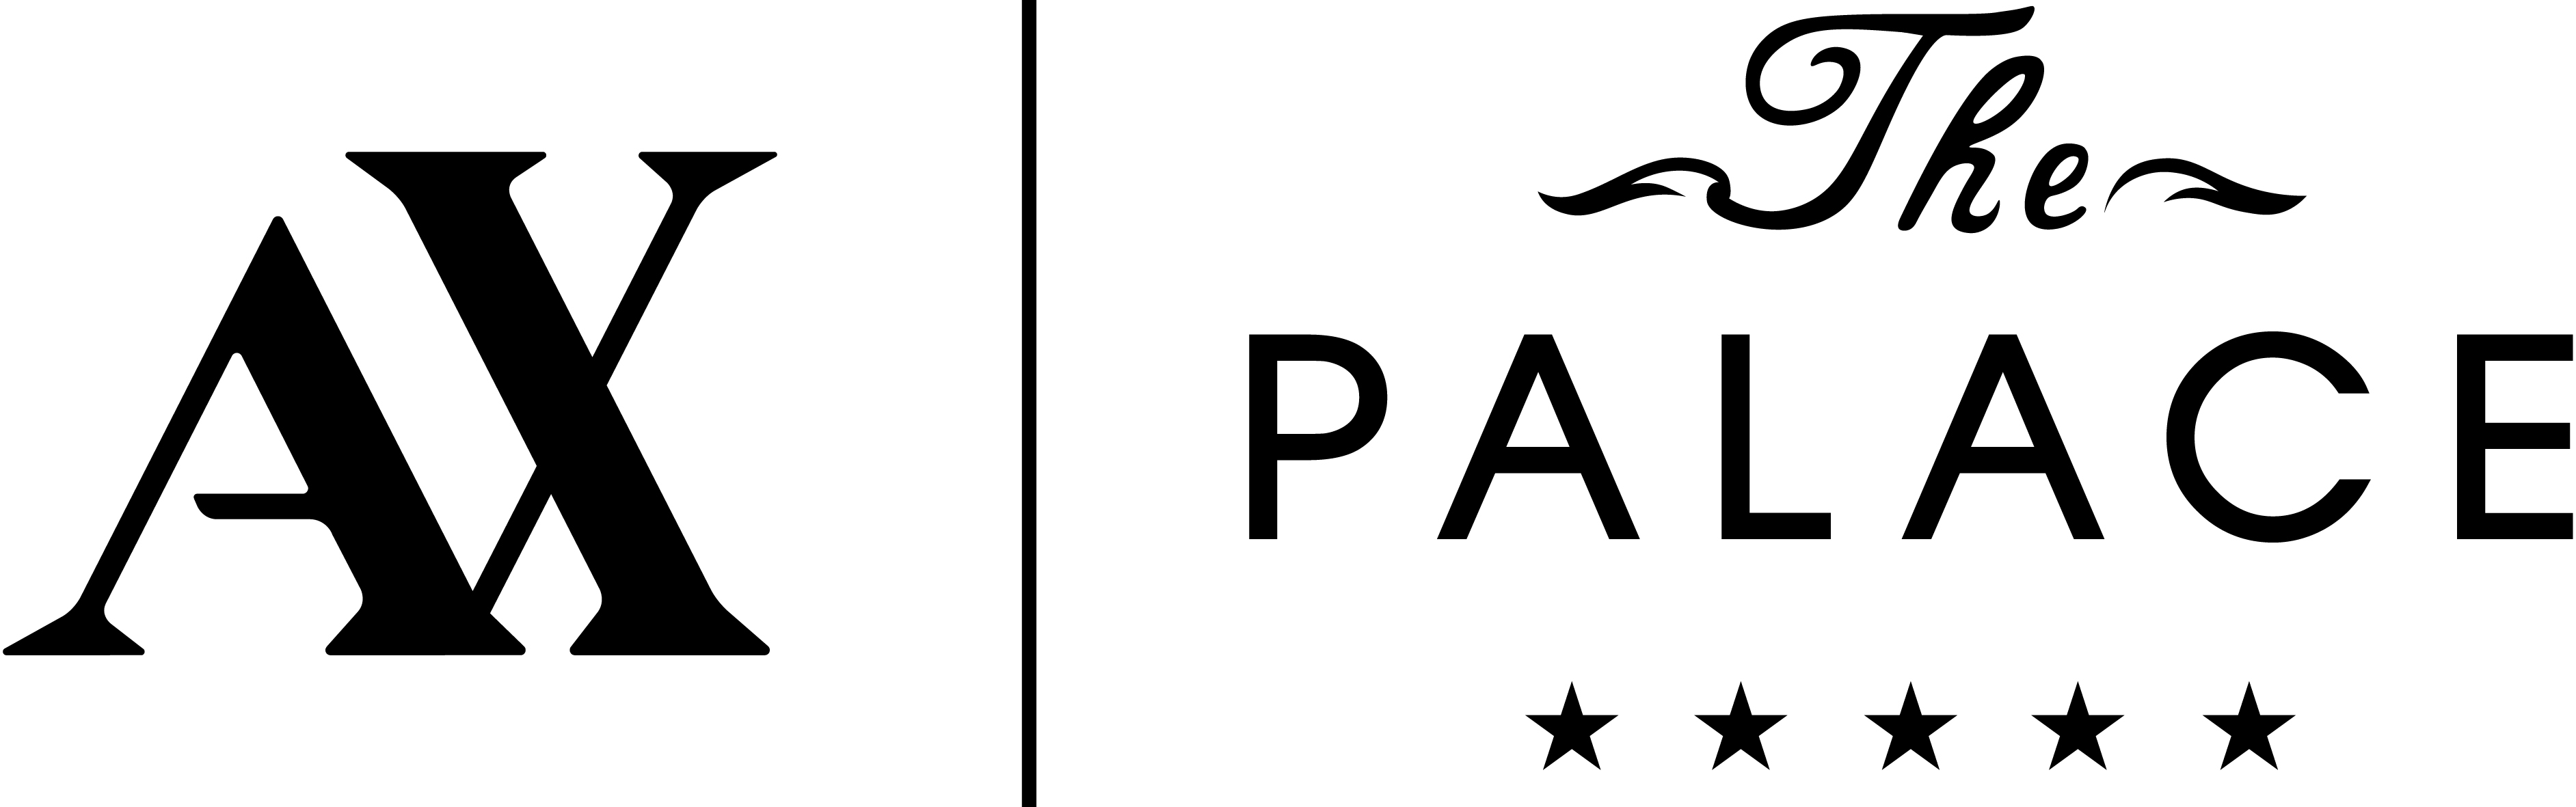 AX hotels logo